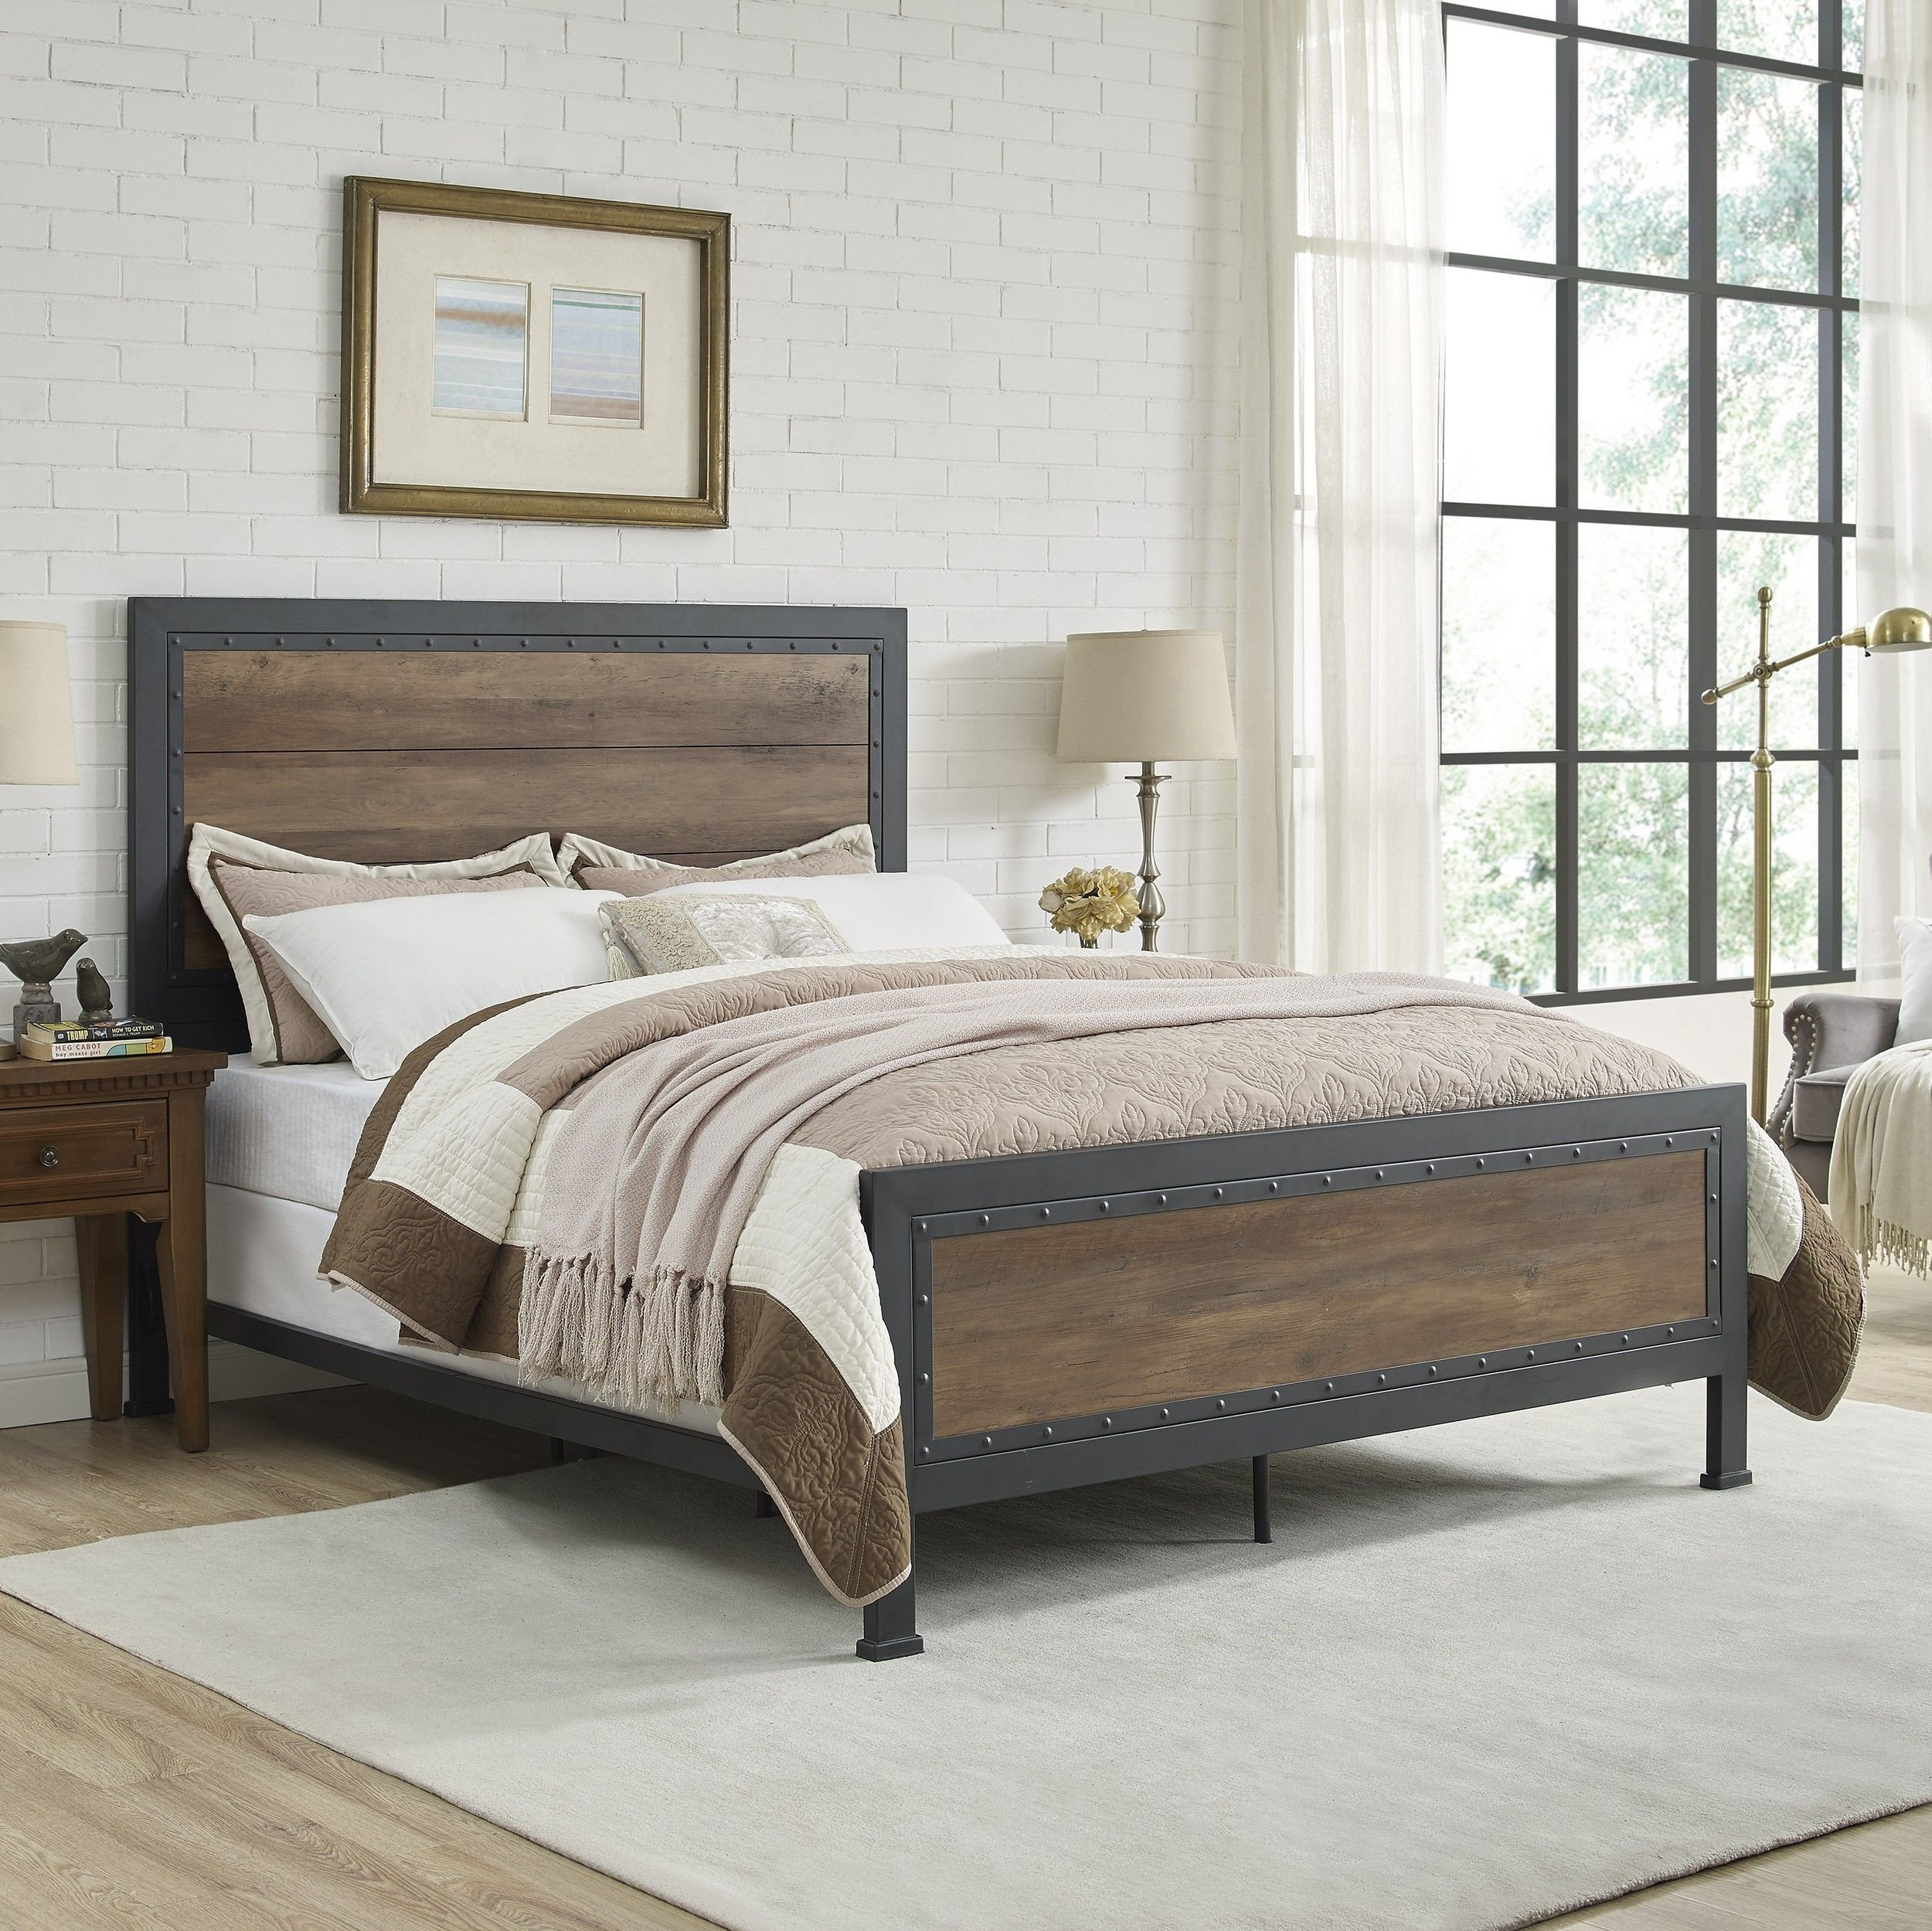 Wood and Metal Bedroom Lovely Walker Edison Bqawro En 2019